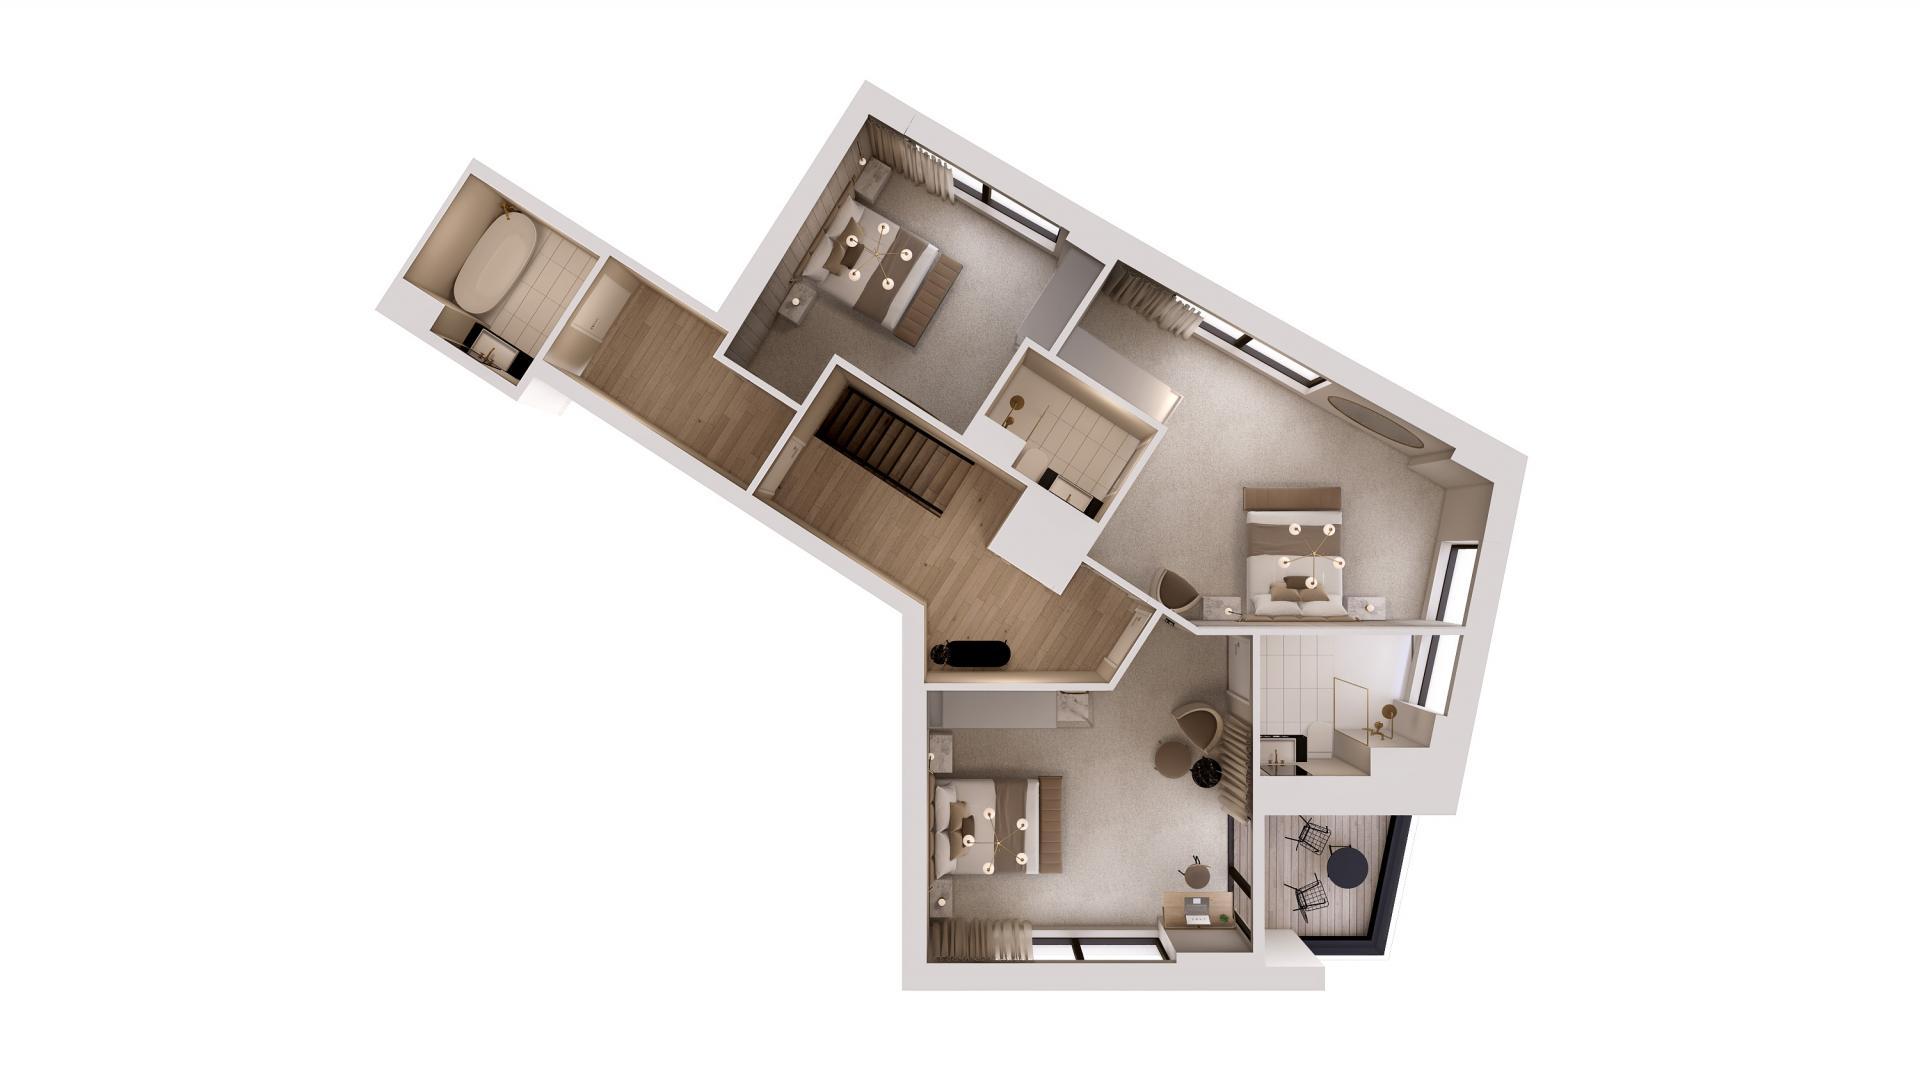 Duplex floor plan at STAY Camden Serviced Apartments, Camden, London